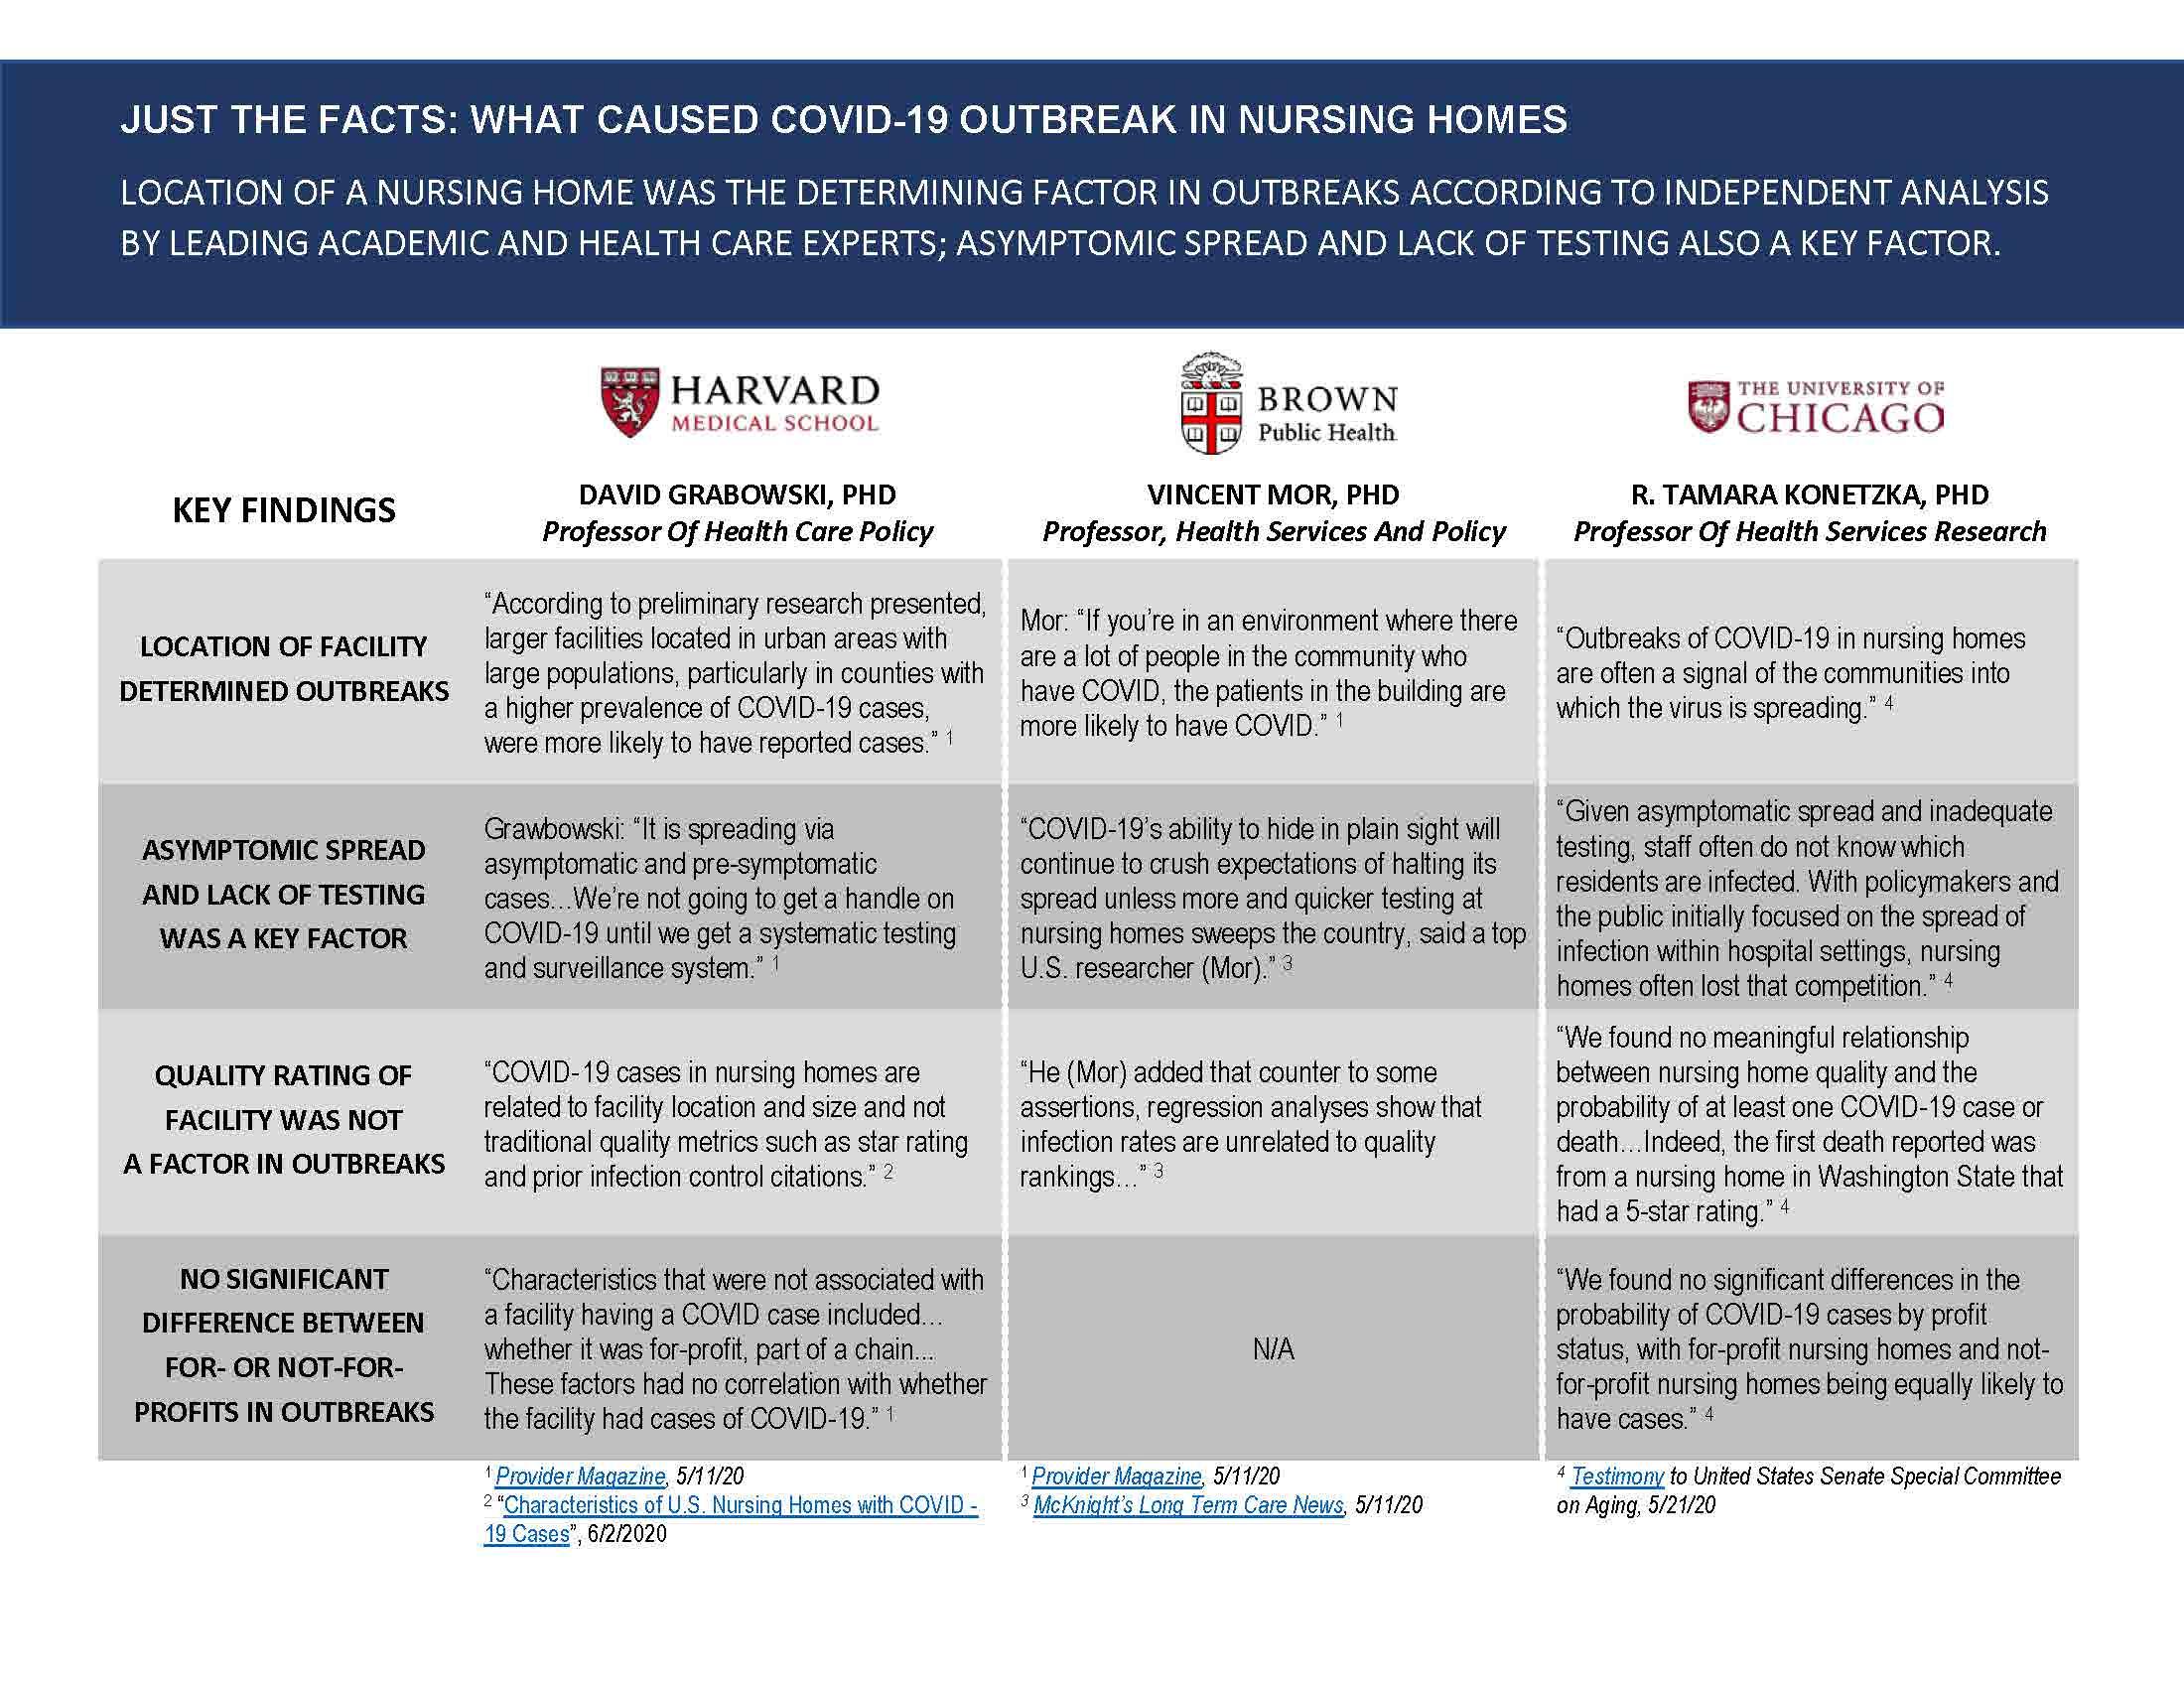 Analysis-COVID-Outbreaks-in-Nursing-Homes